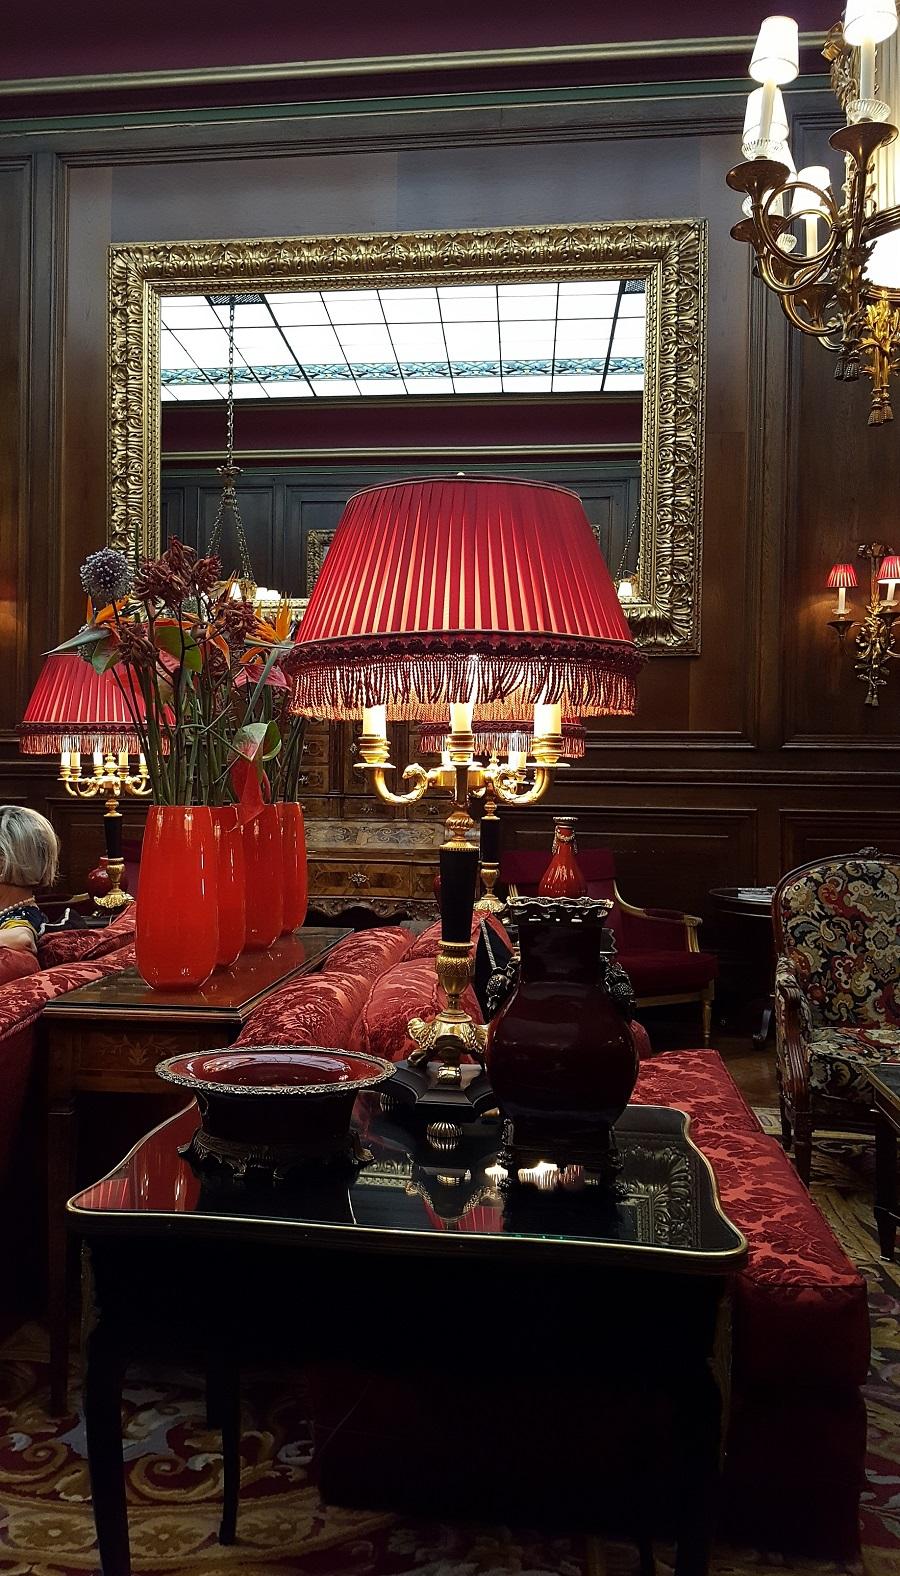 Hotel Sacher Vienna, Lobby